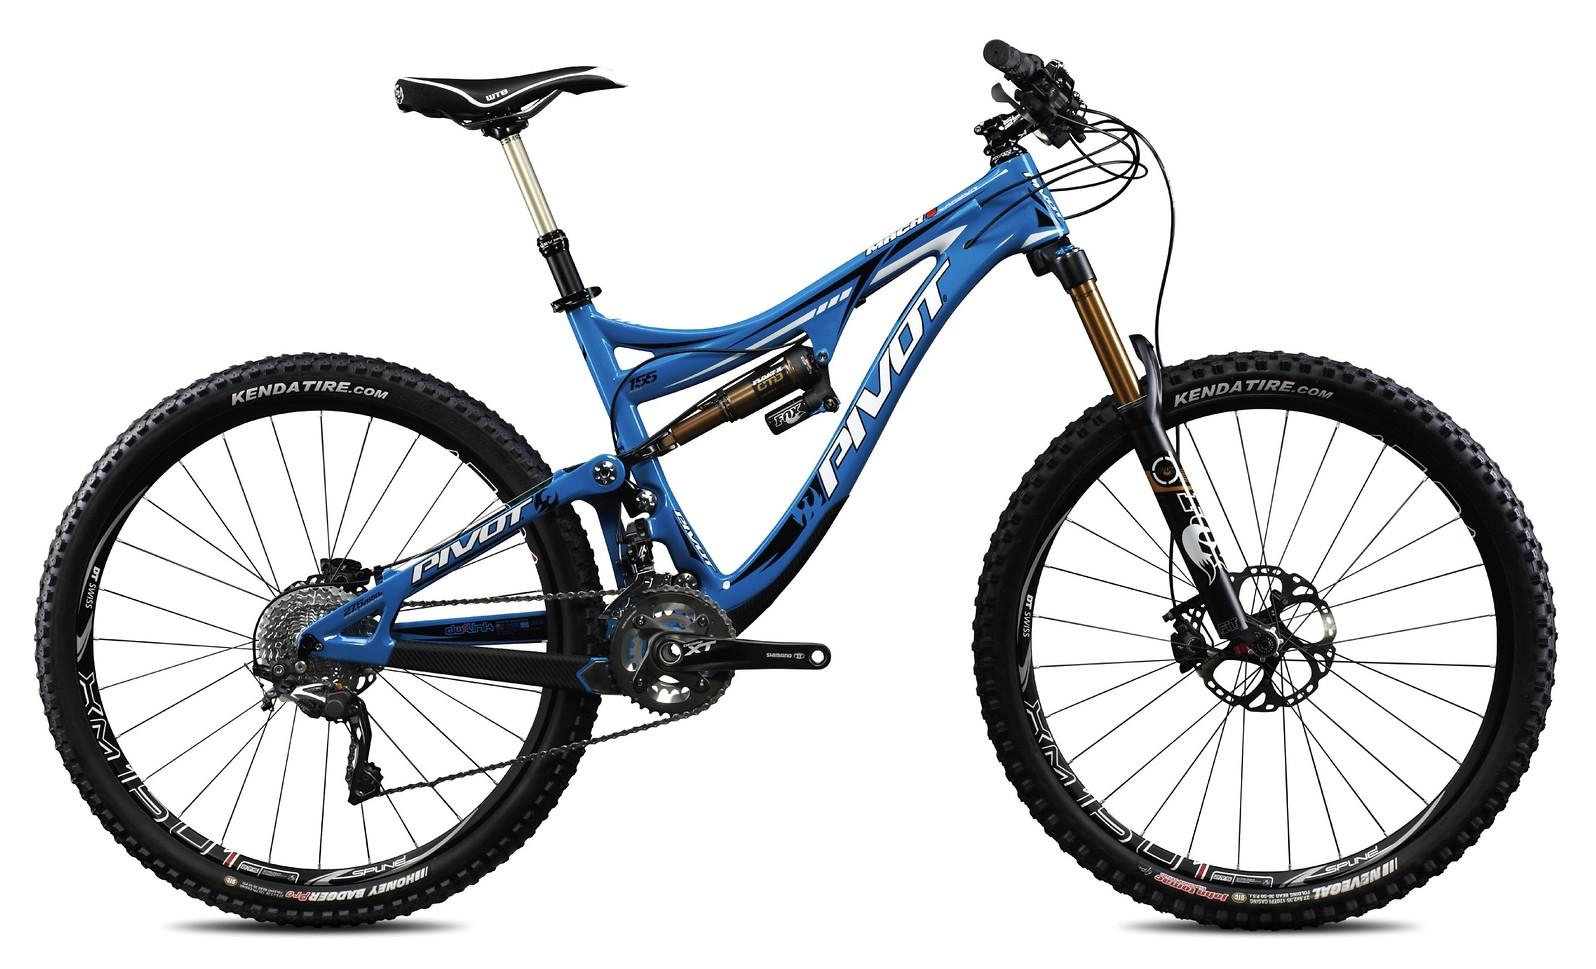 Pivot Mach 6 Carbon Bike - electric blue with Shimano XT:XTR Pro Build